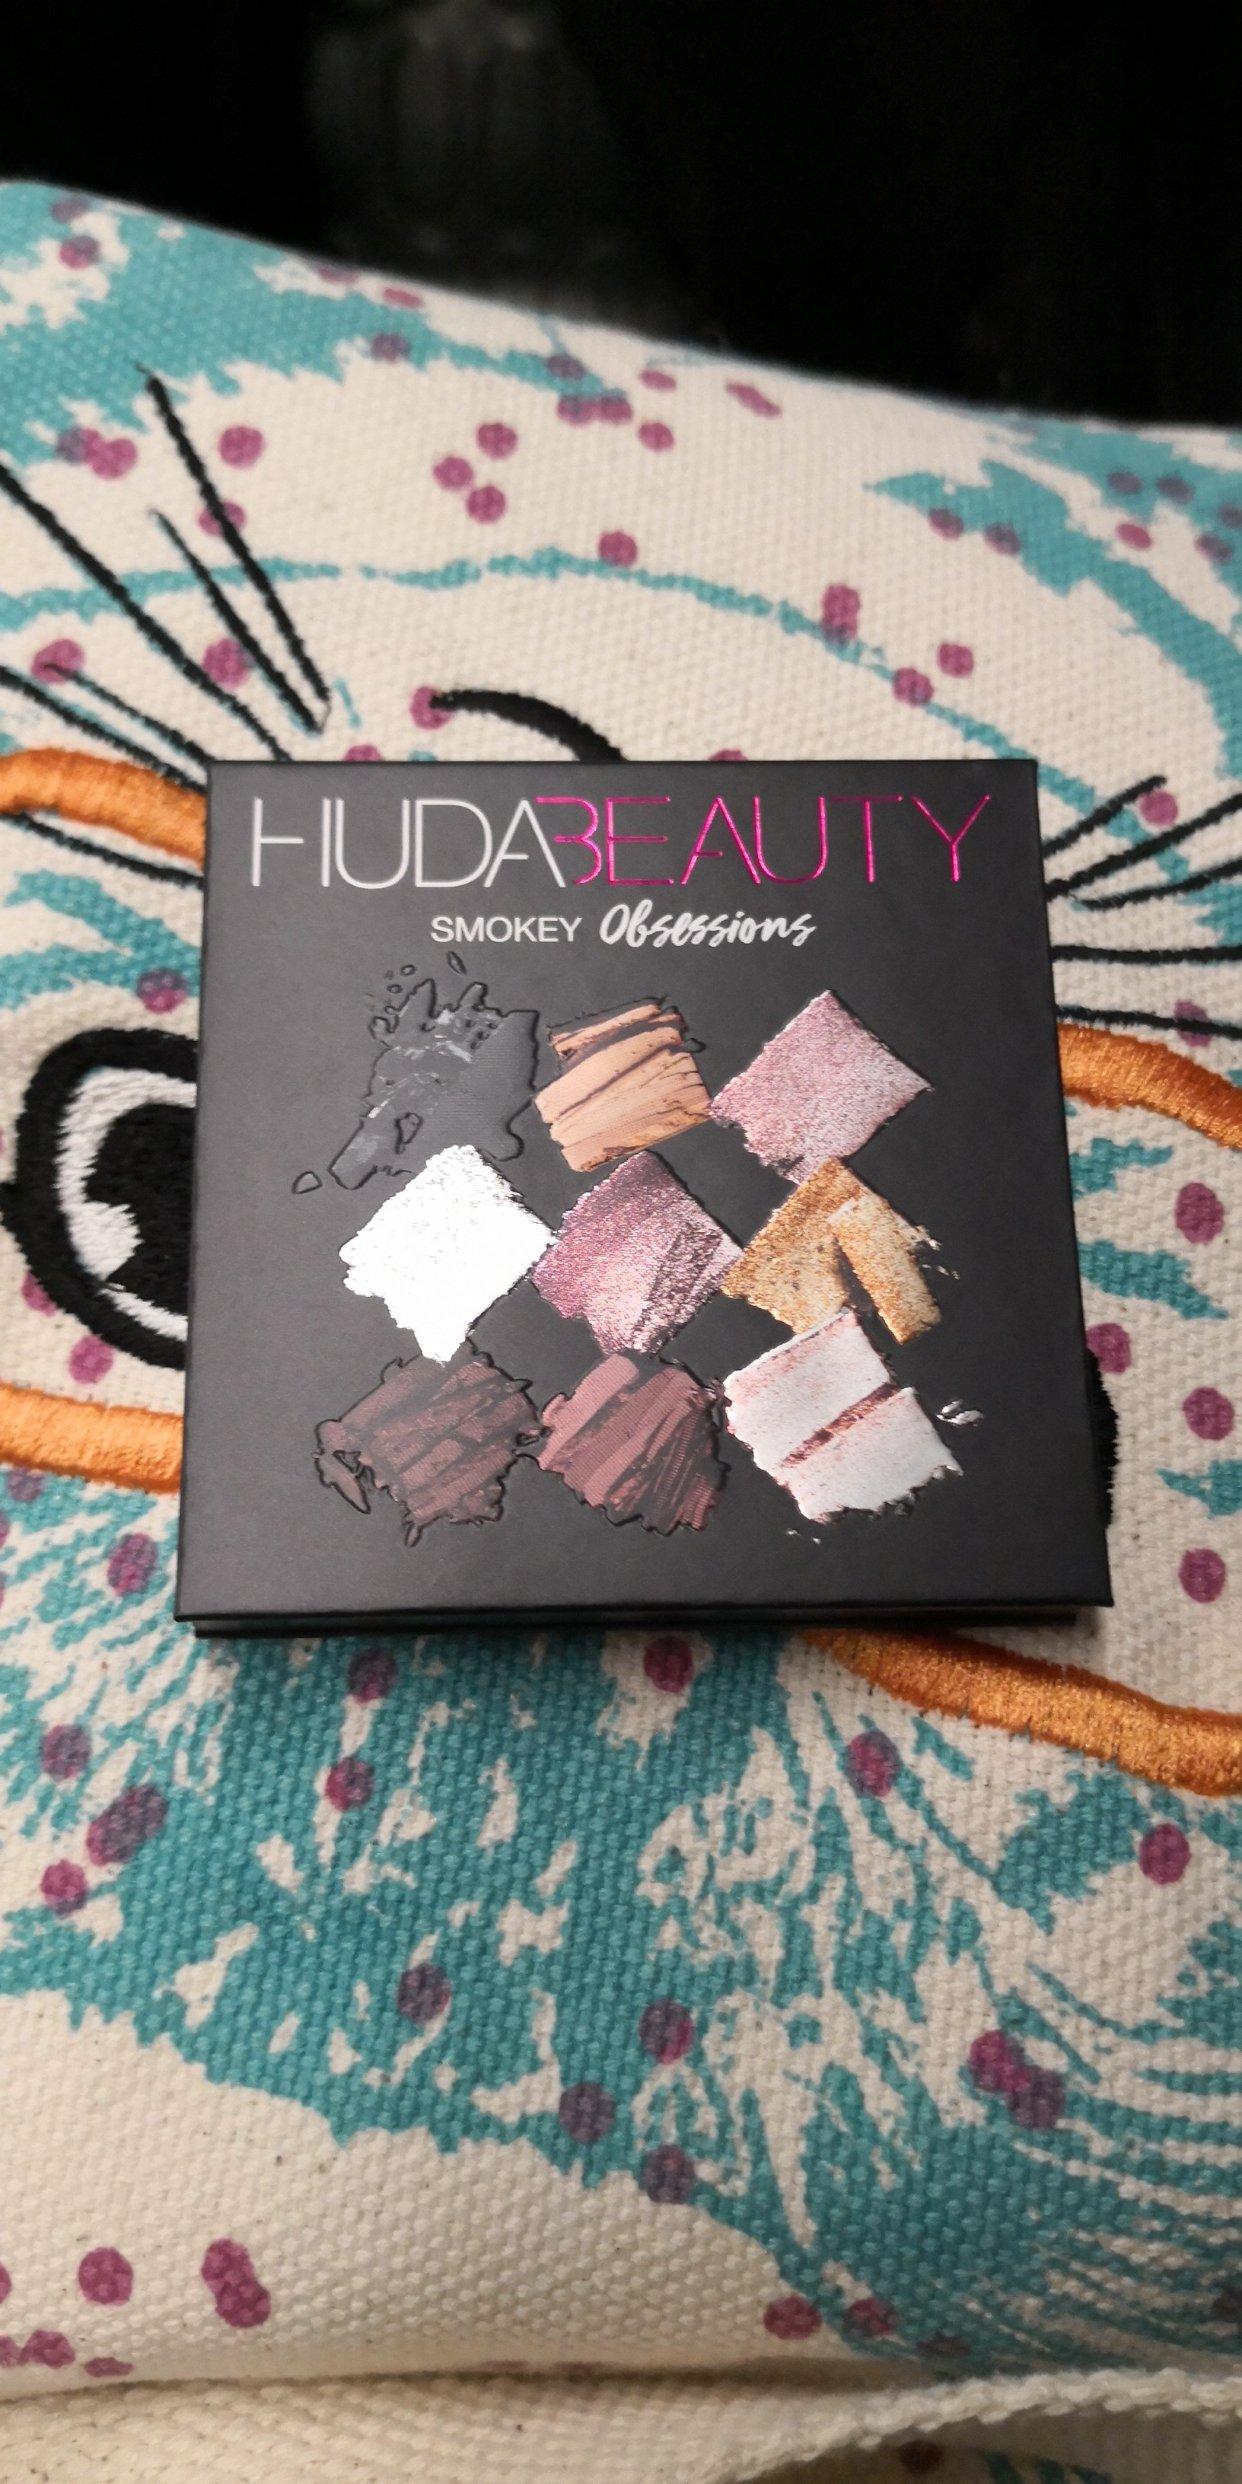 huda beauty 9色盘smokey